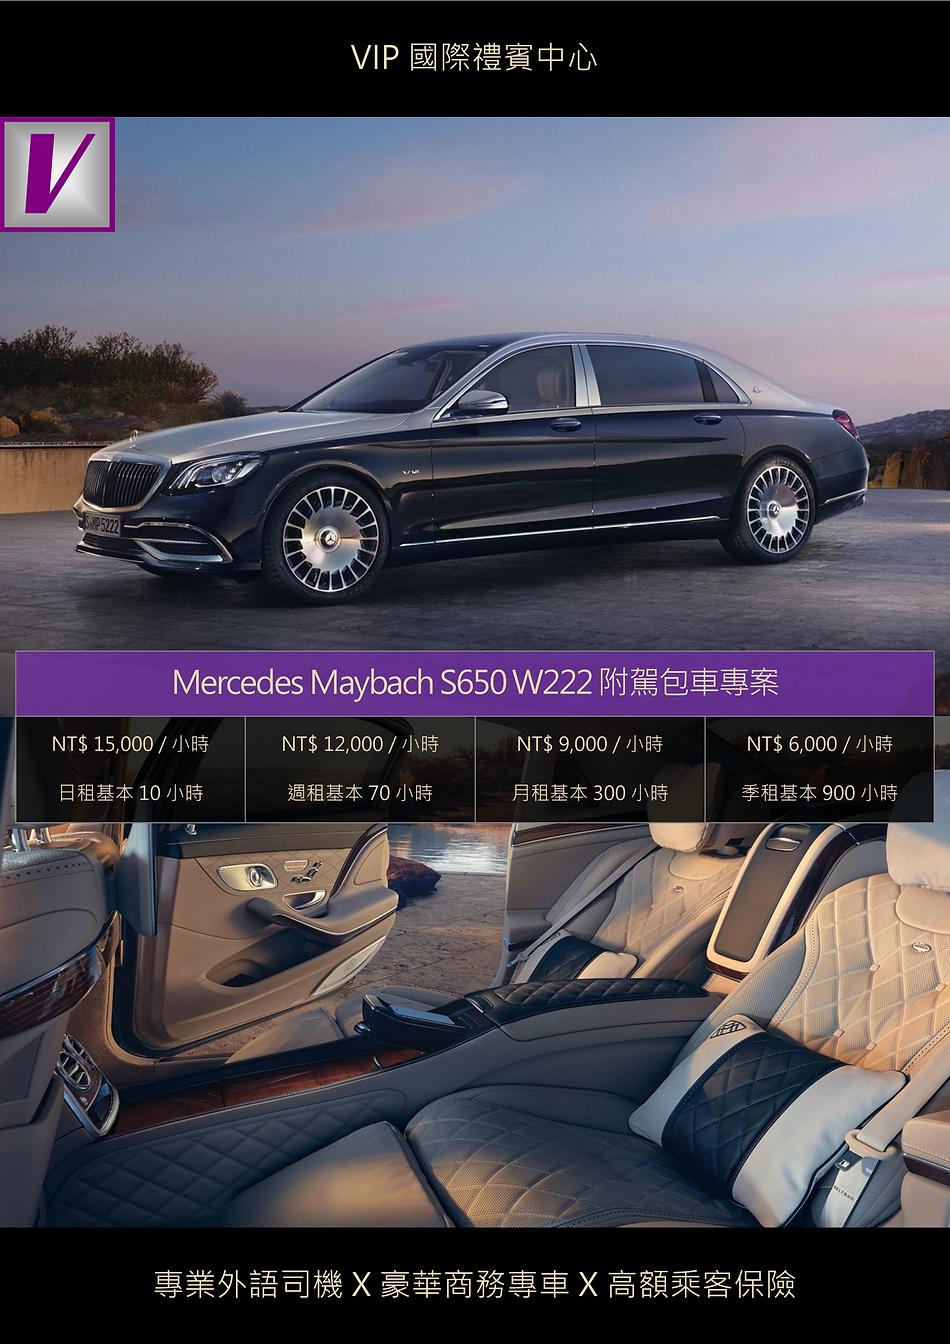 VIP國際禮賓中心 MERCEDES MAYBACH S650 W222 附駕包車專案 DM.png